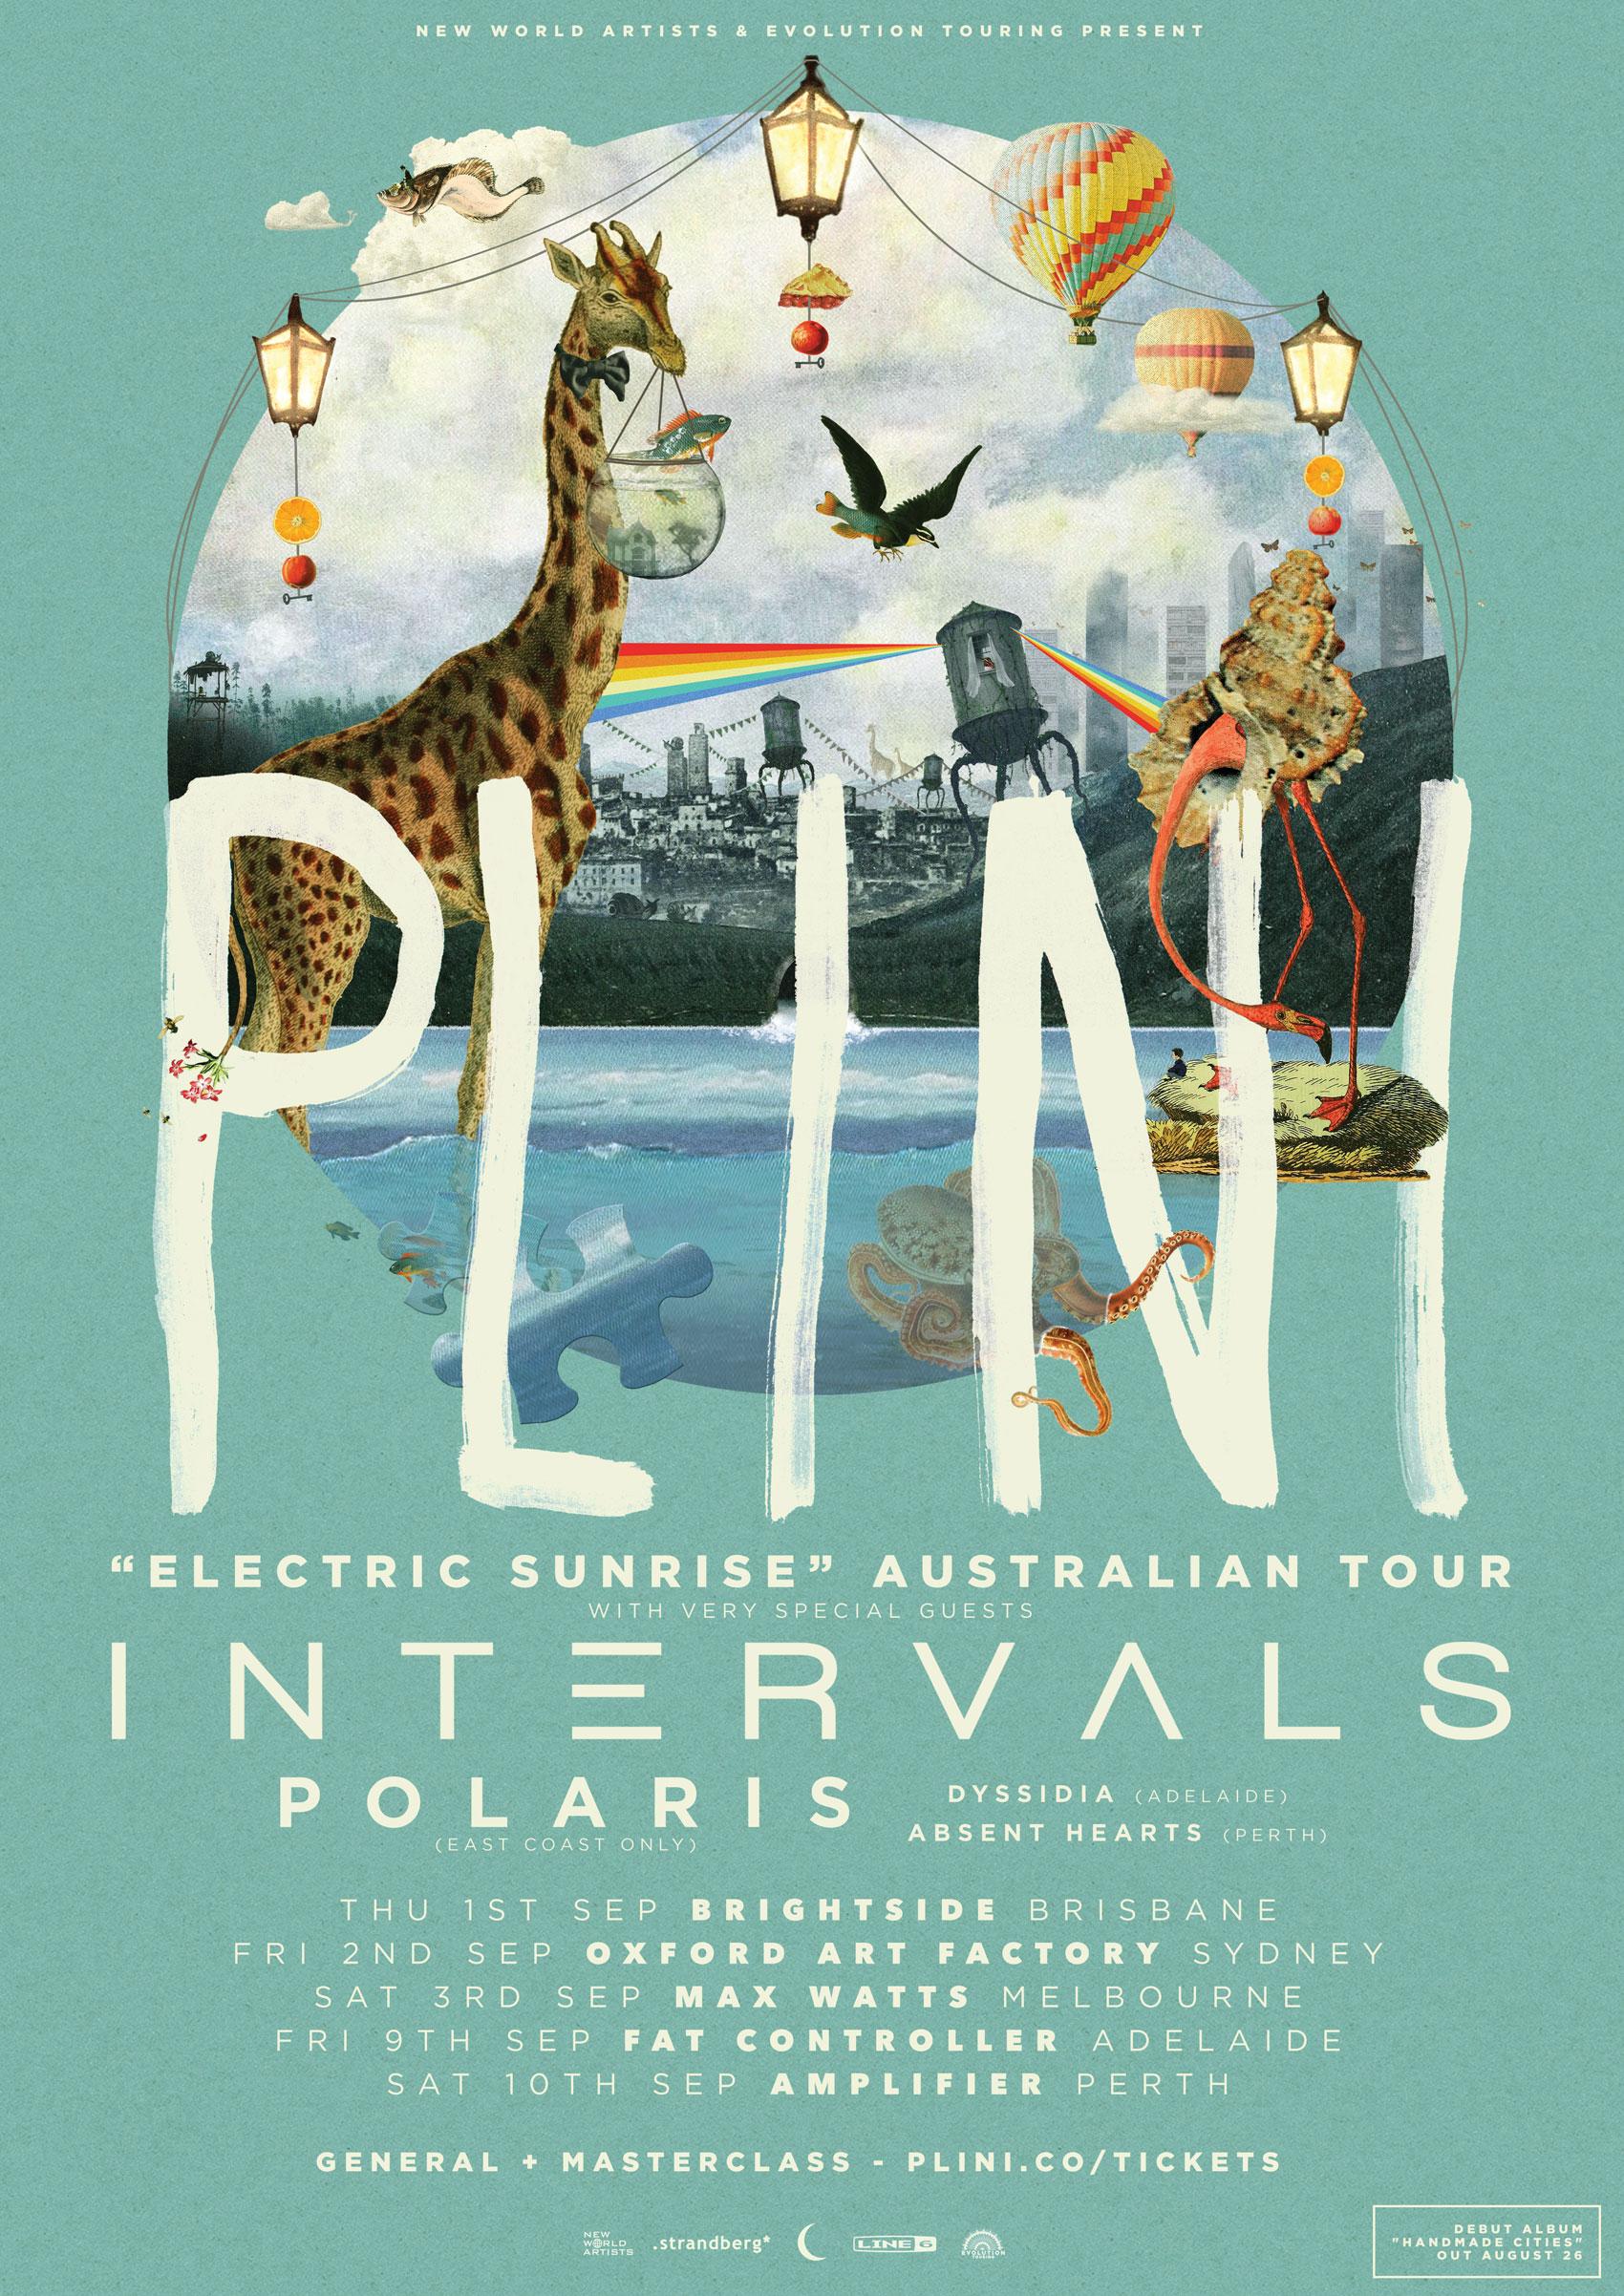 Plini (AUS) + Intervals (CAN) - Australian Tour